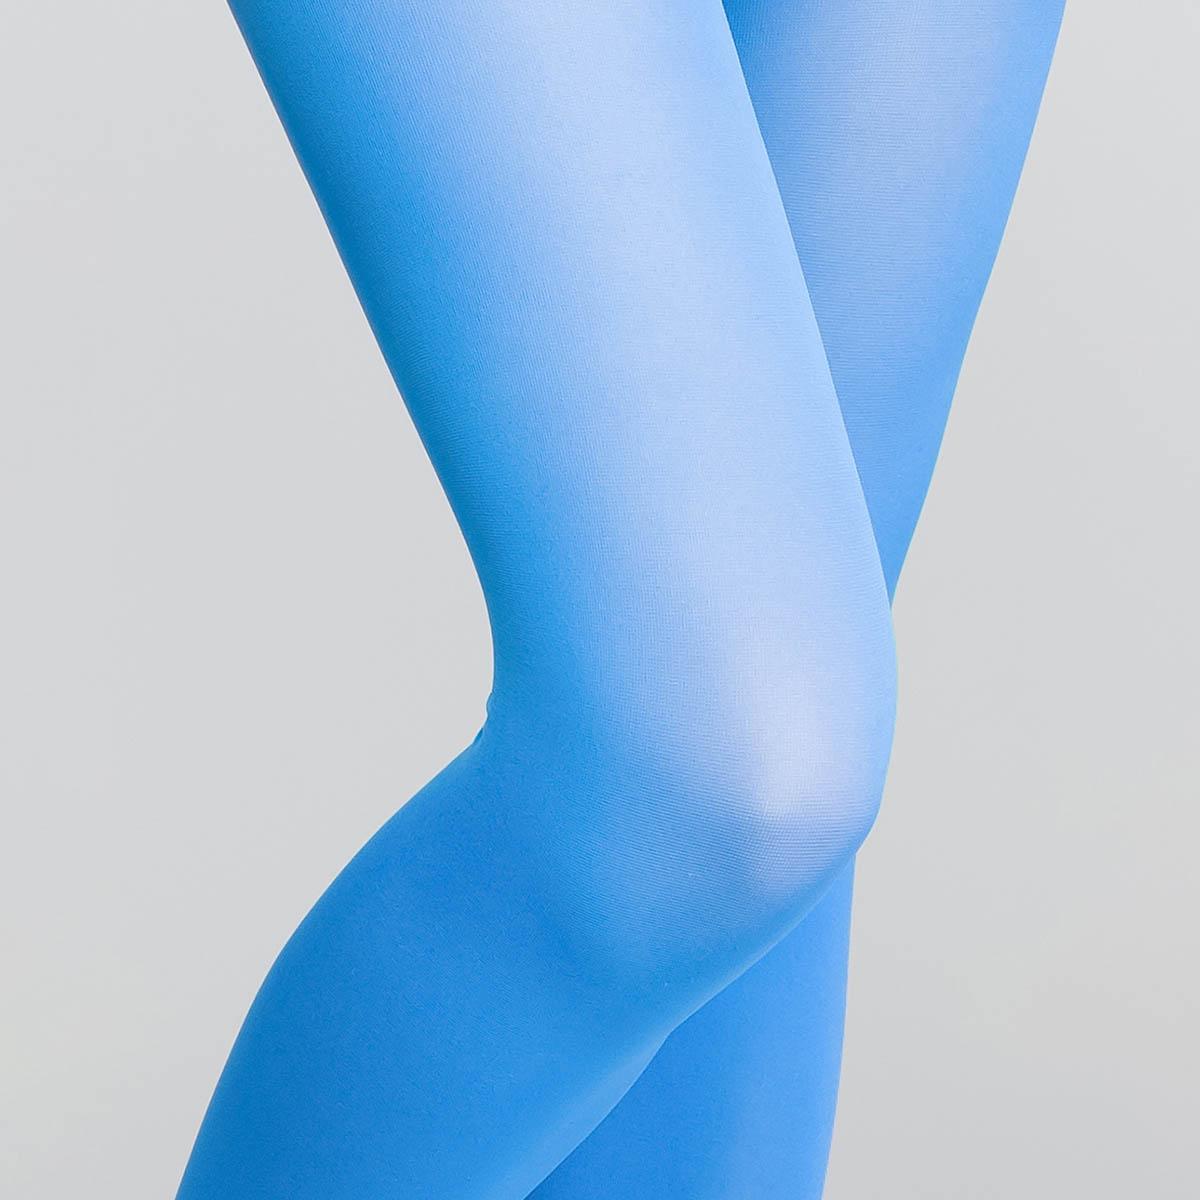 37a745602 ... DIM Imperial blue Opaque 50 tights - DIM Style, , DIM